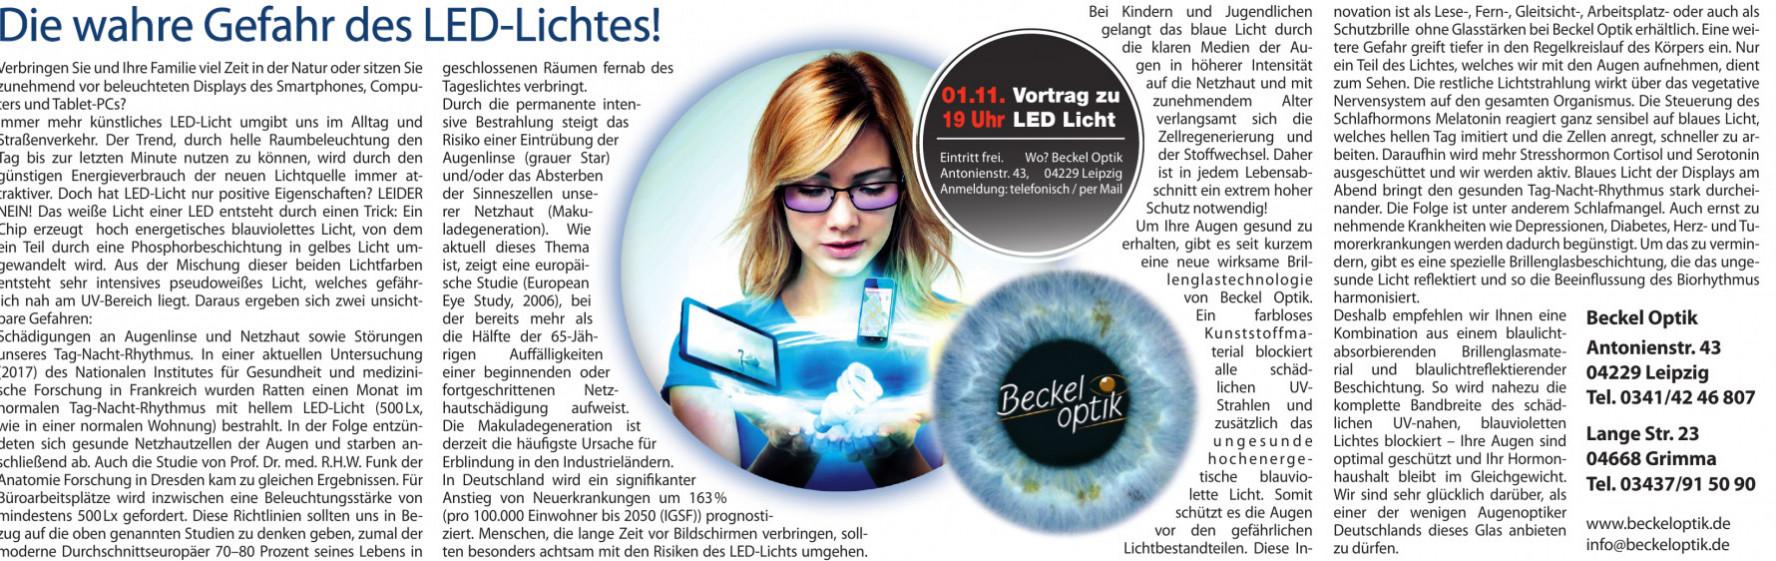 Beckel Optik